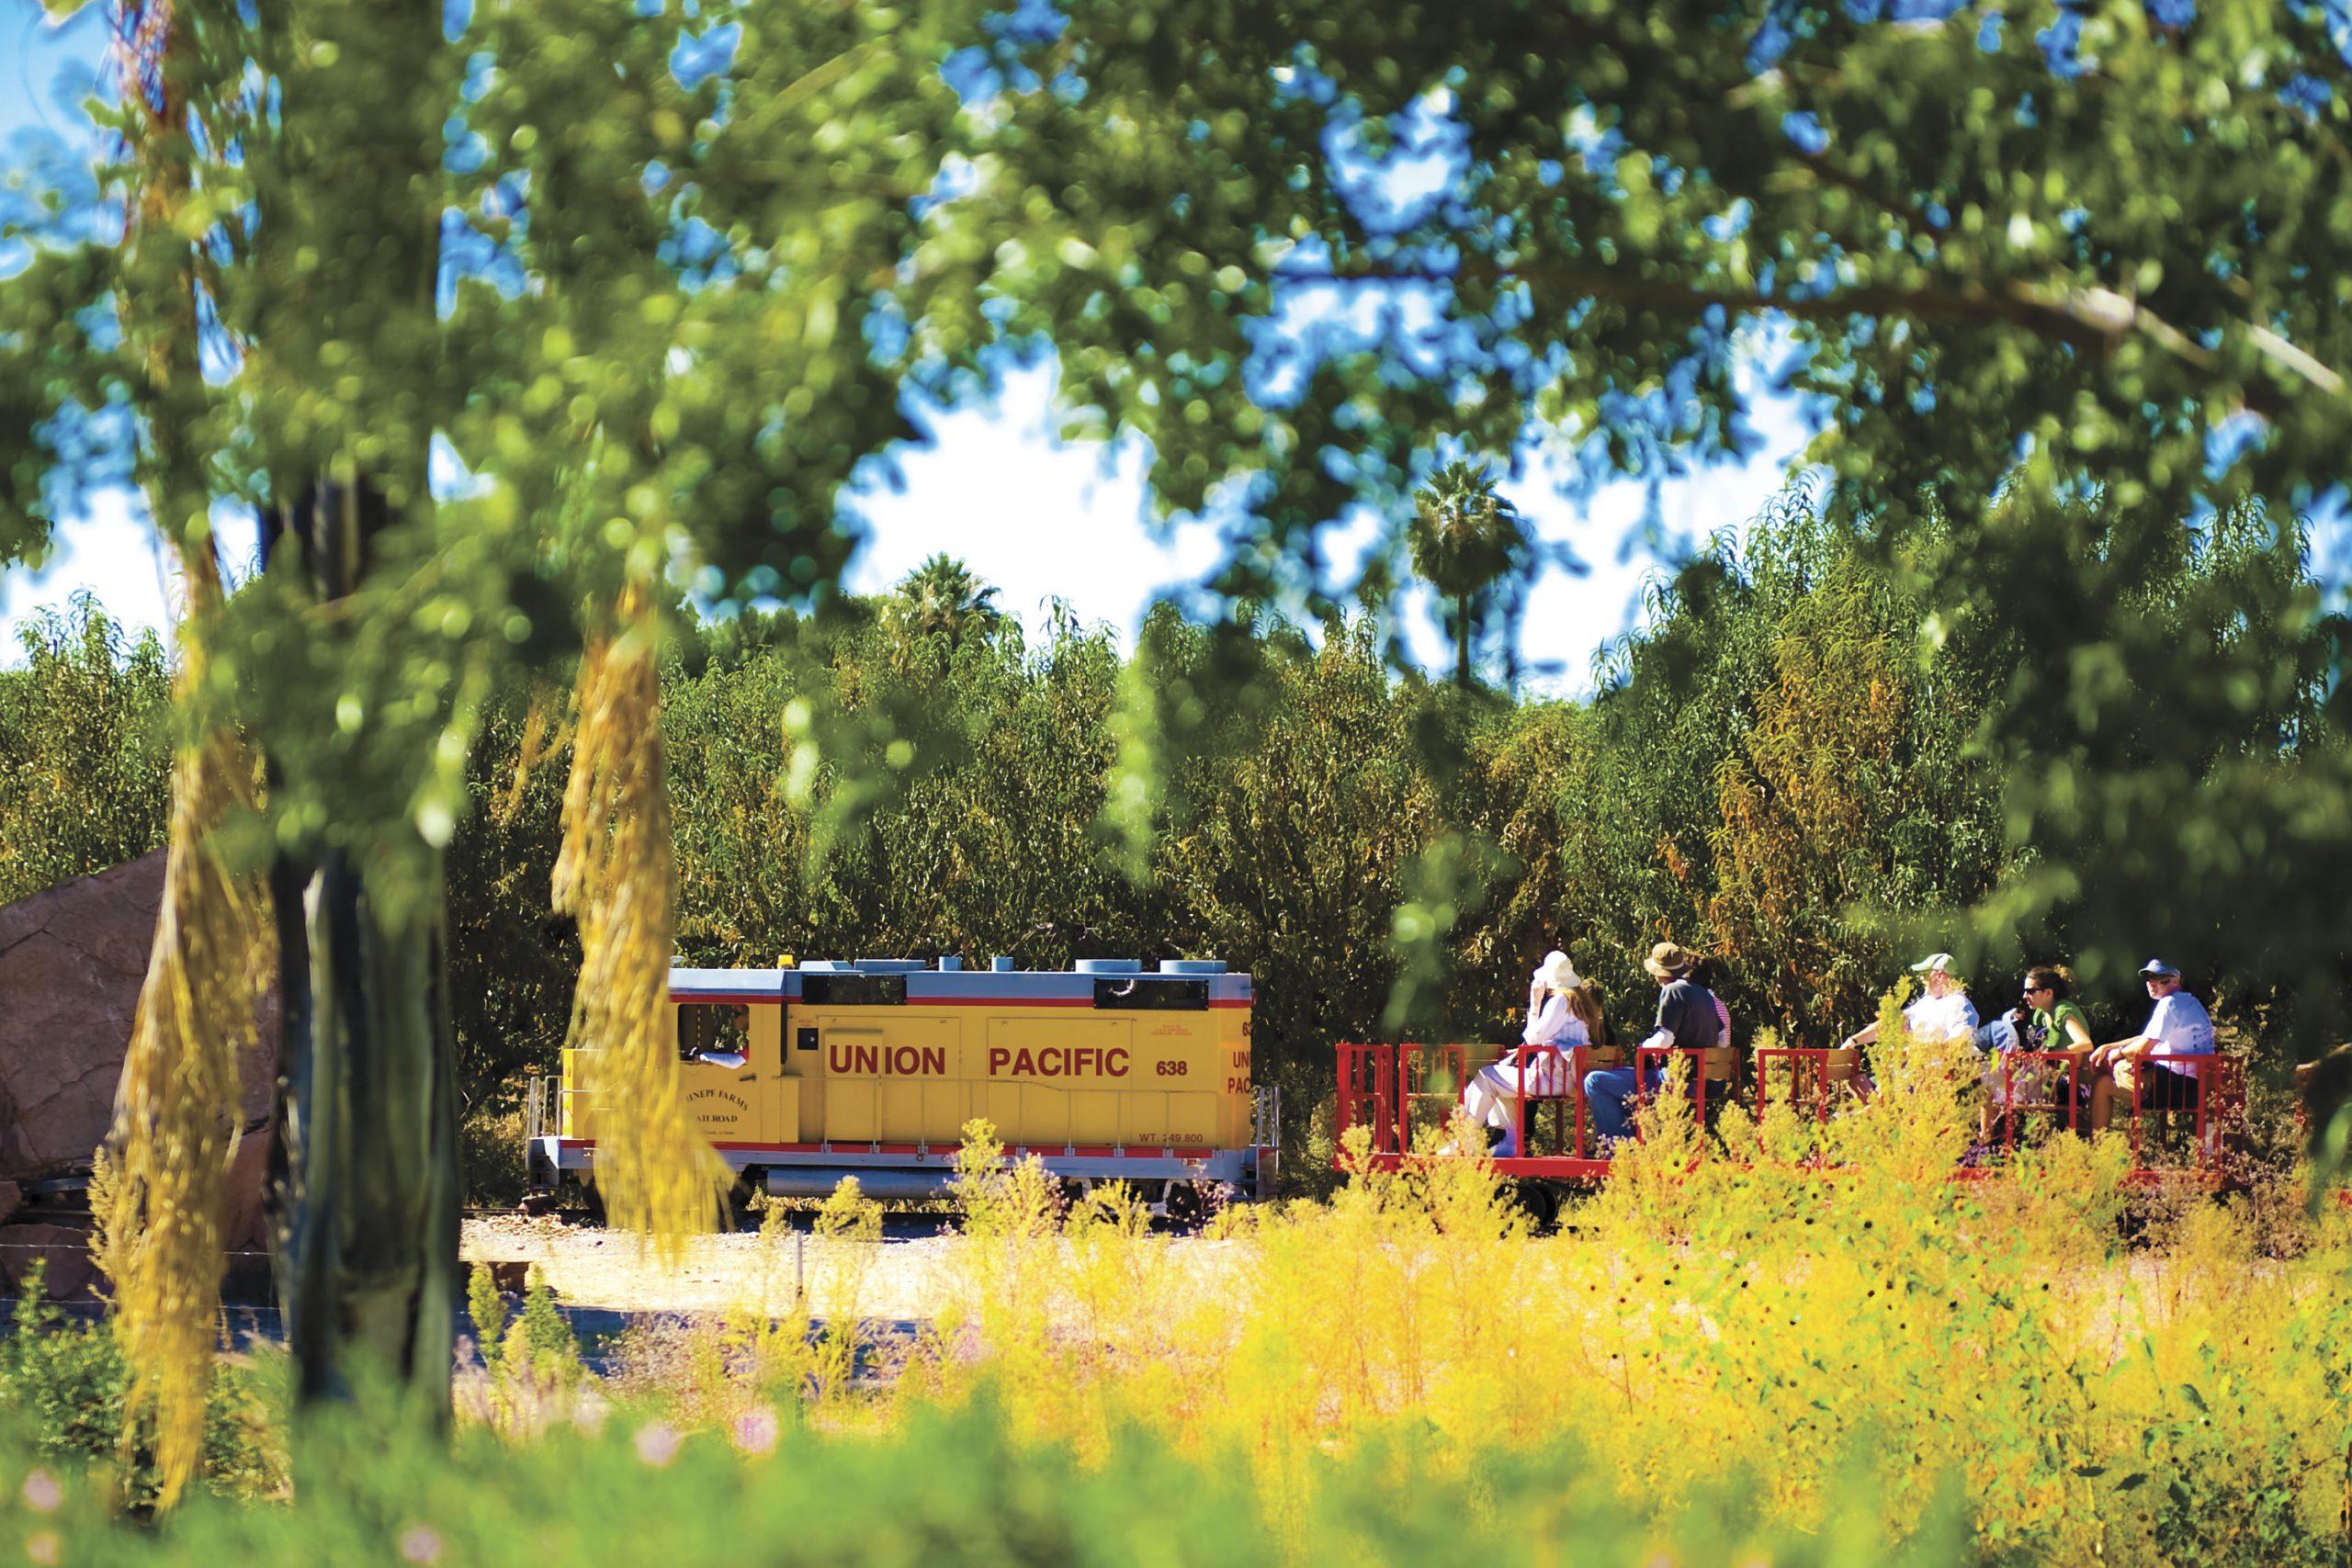 train ride at Schnepf Farms; Photo by Foskett Creative/Courtesy Schnepf Farms